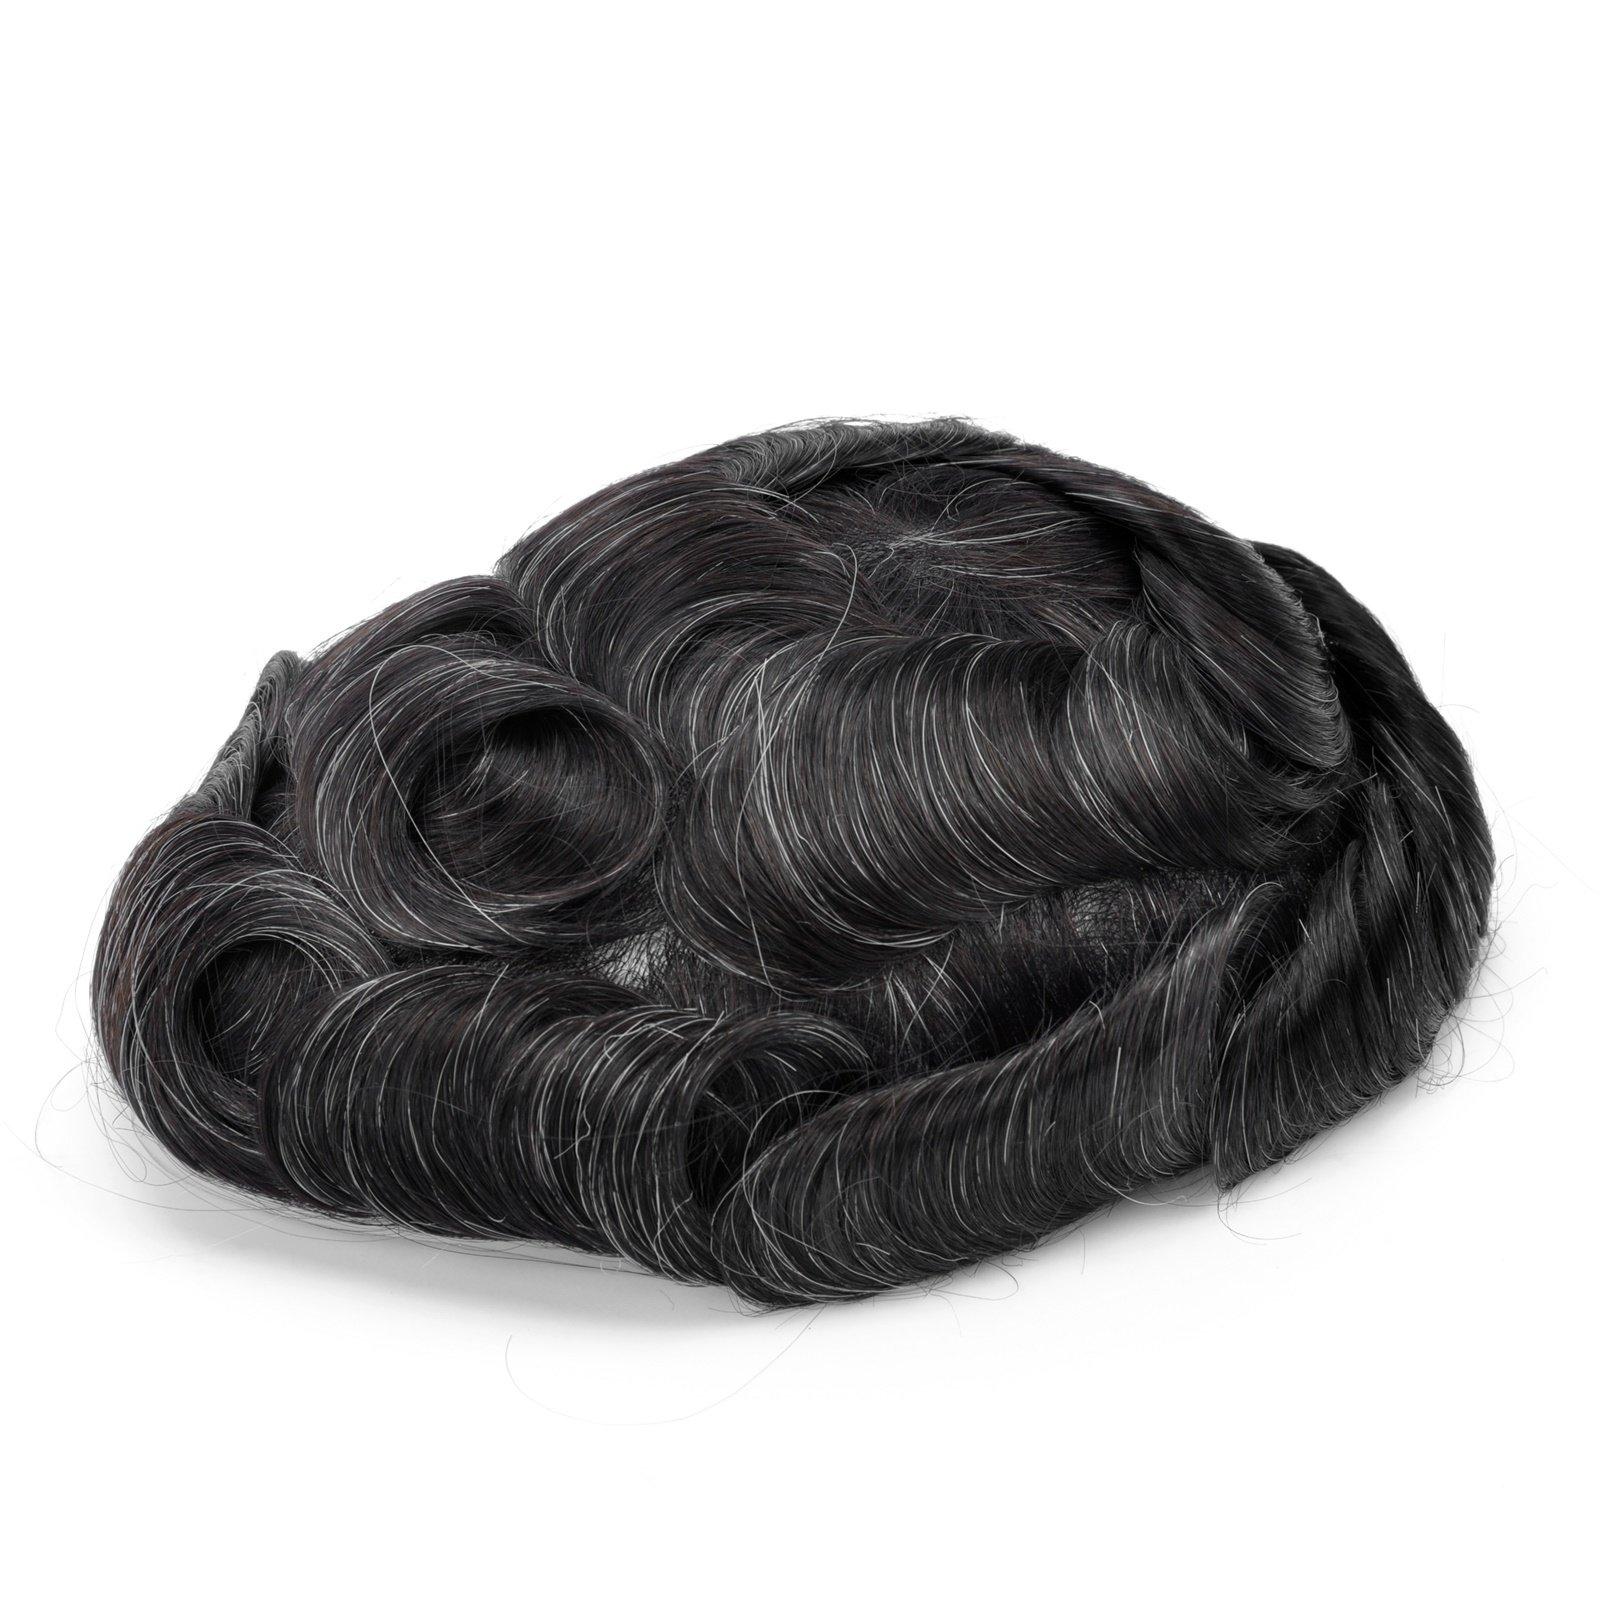 GEX 63Colors Men's HairPiece Toupee Medium Density Wig Human Hair Replacement Systems Vivid Men's Toupee Bella Basement (1B10#)